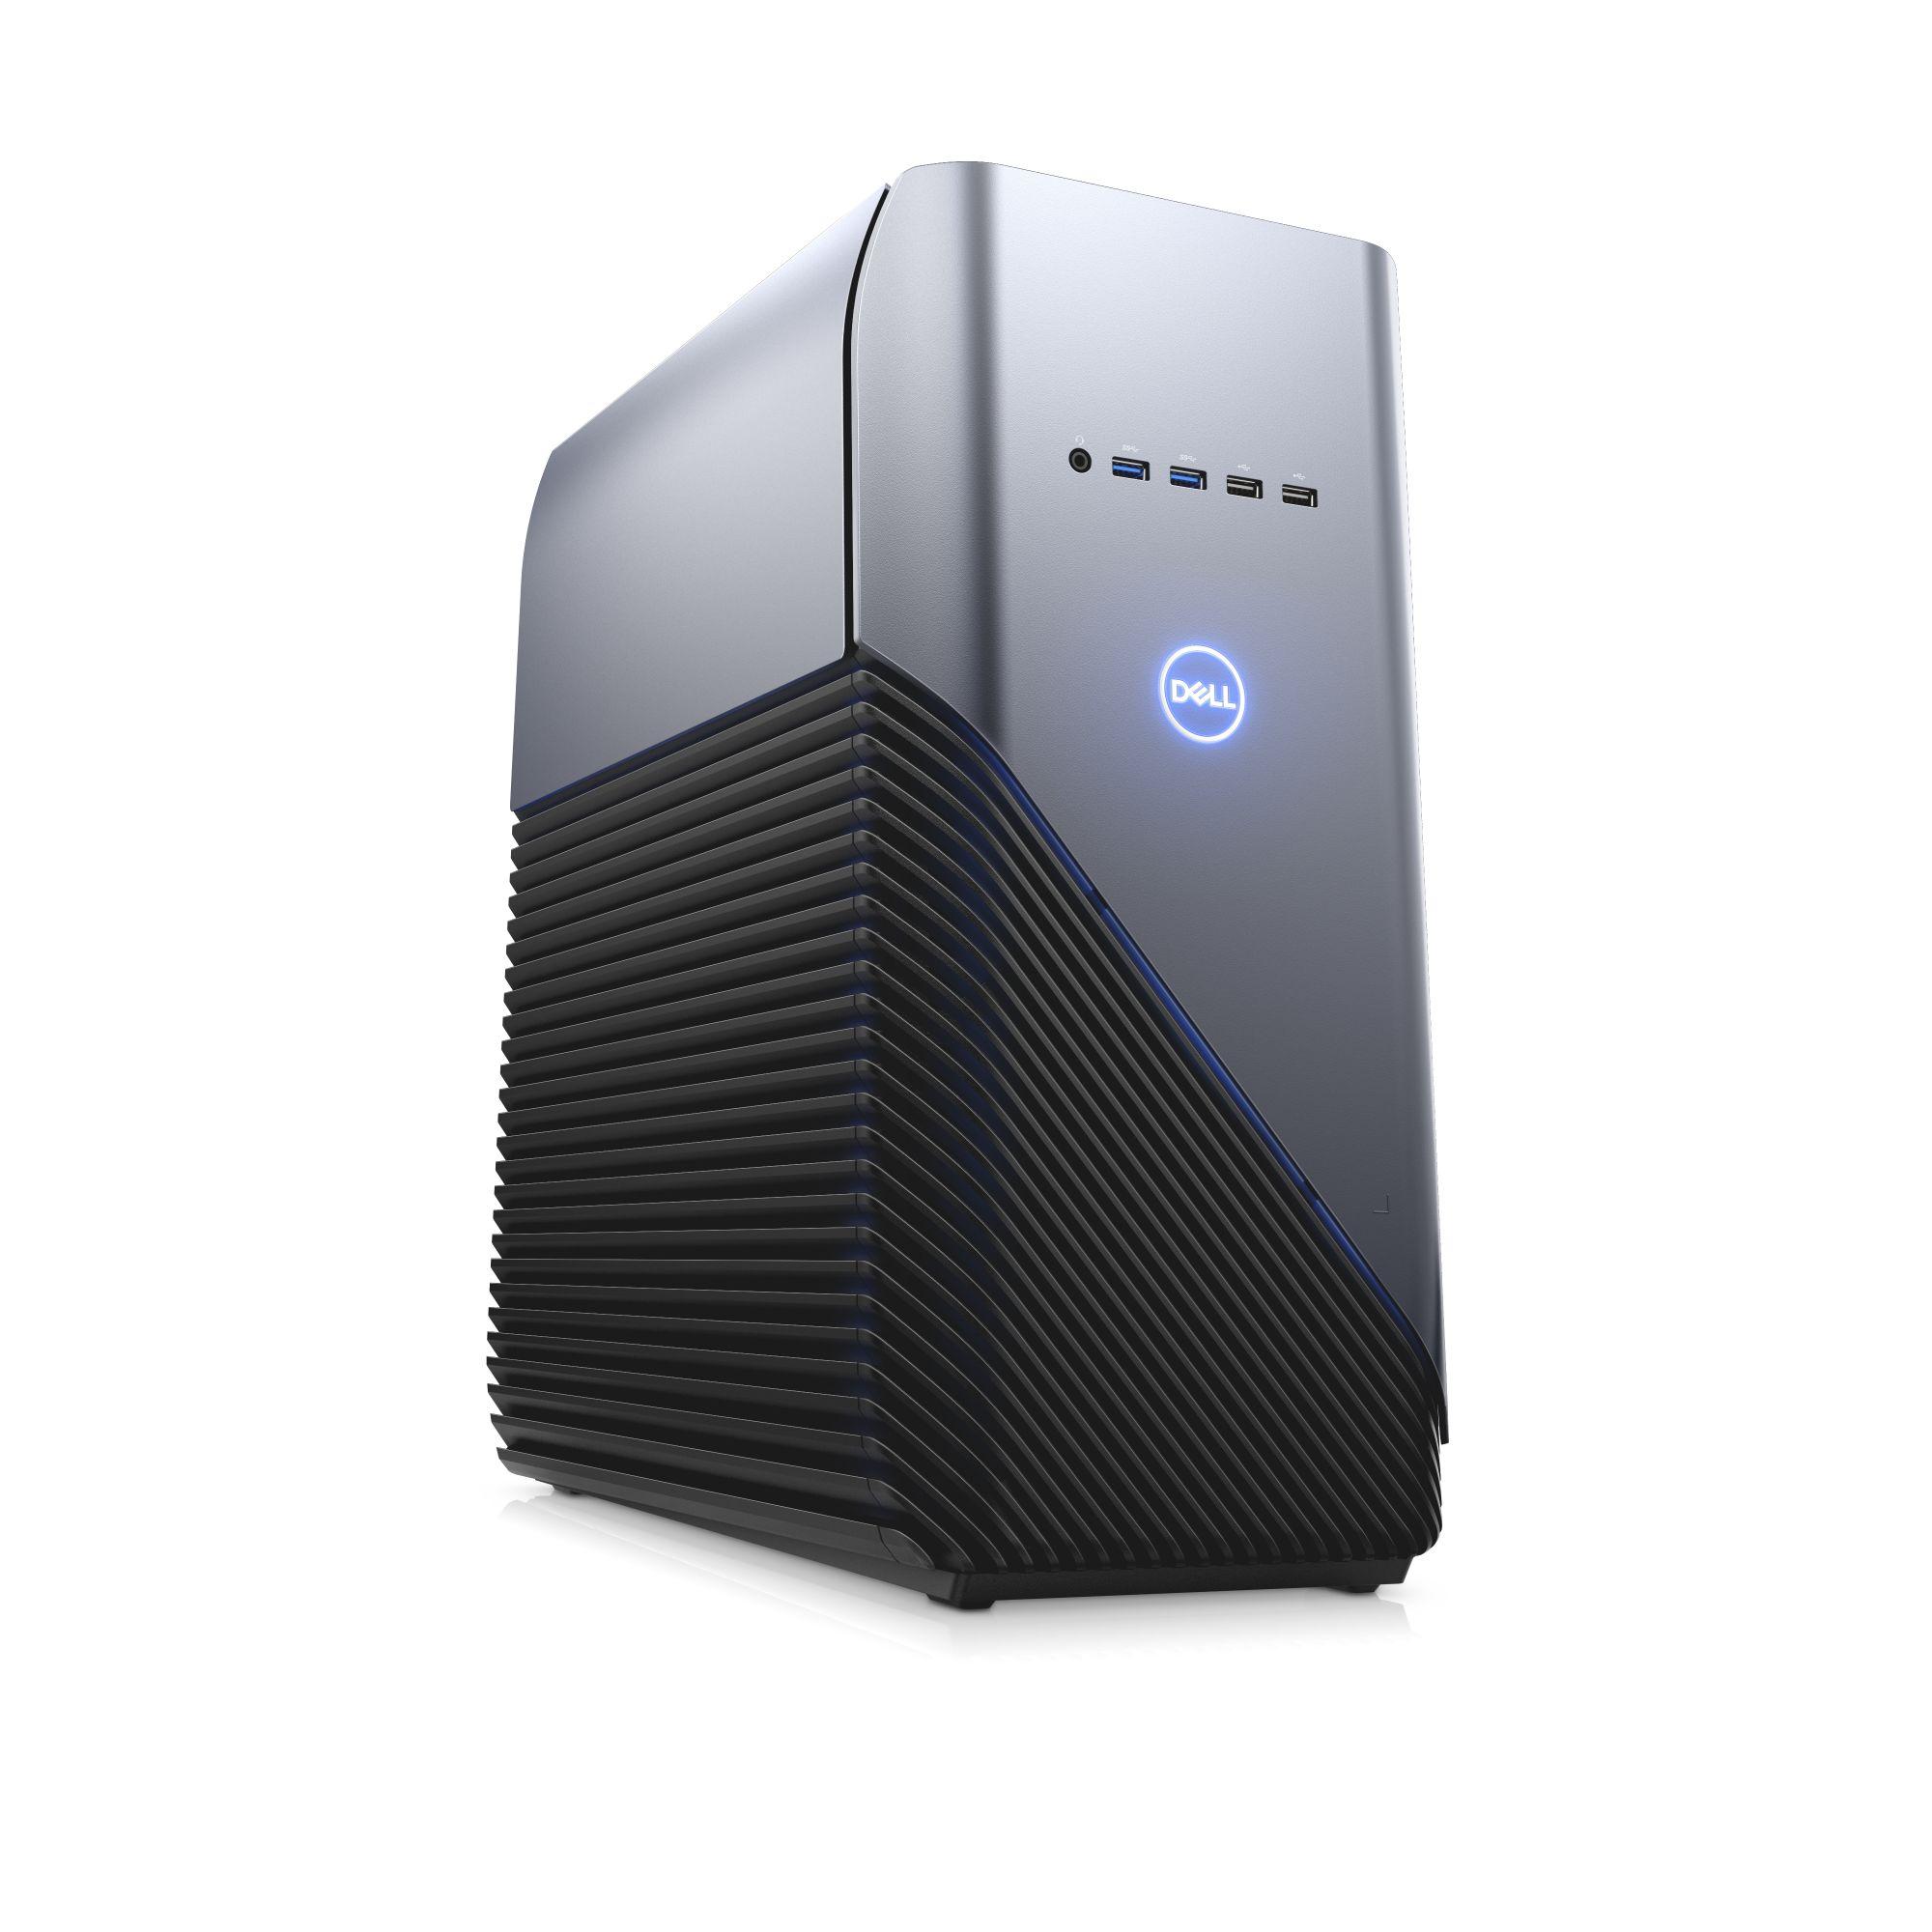 Dell PC Inspiron 5680 i5-8400/8GB/128S+1TB/GTX1060-6GB/HDMI/DP/DVI/USB-C/WiFi+BT/DVD-RW/W10/2RNBD